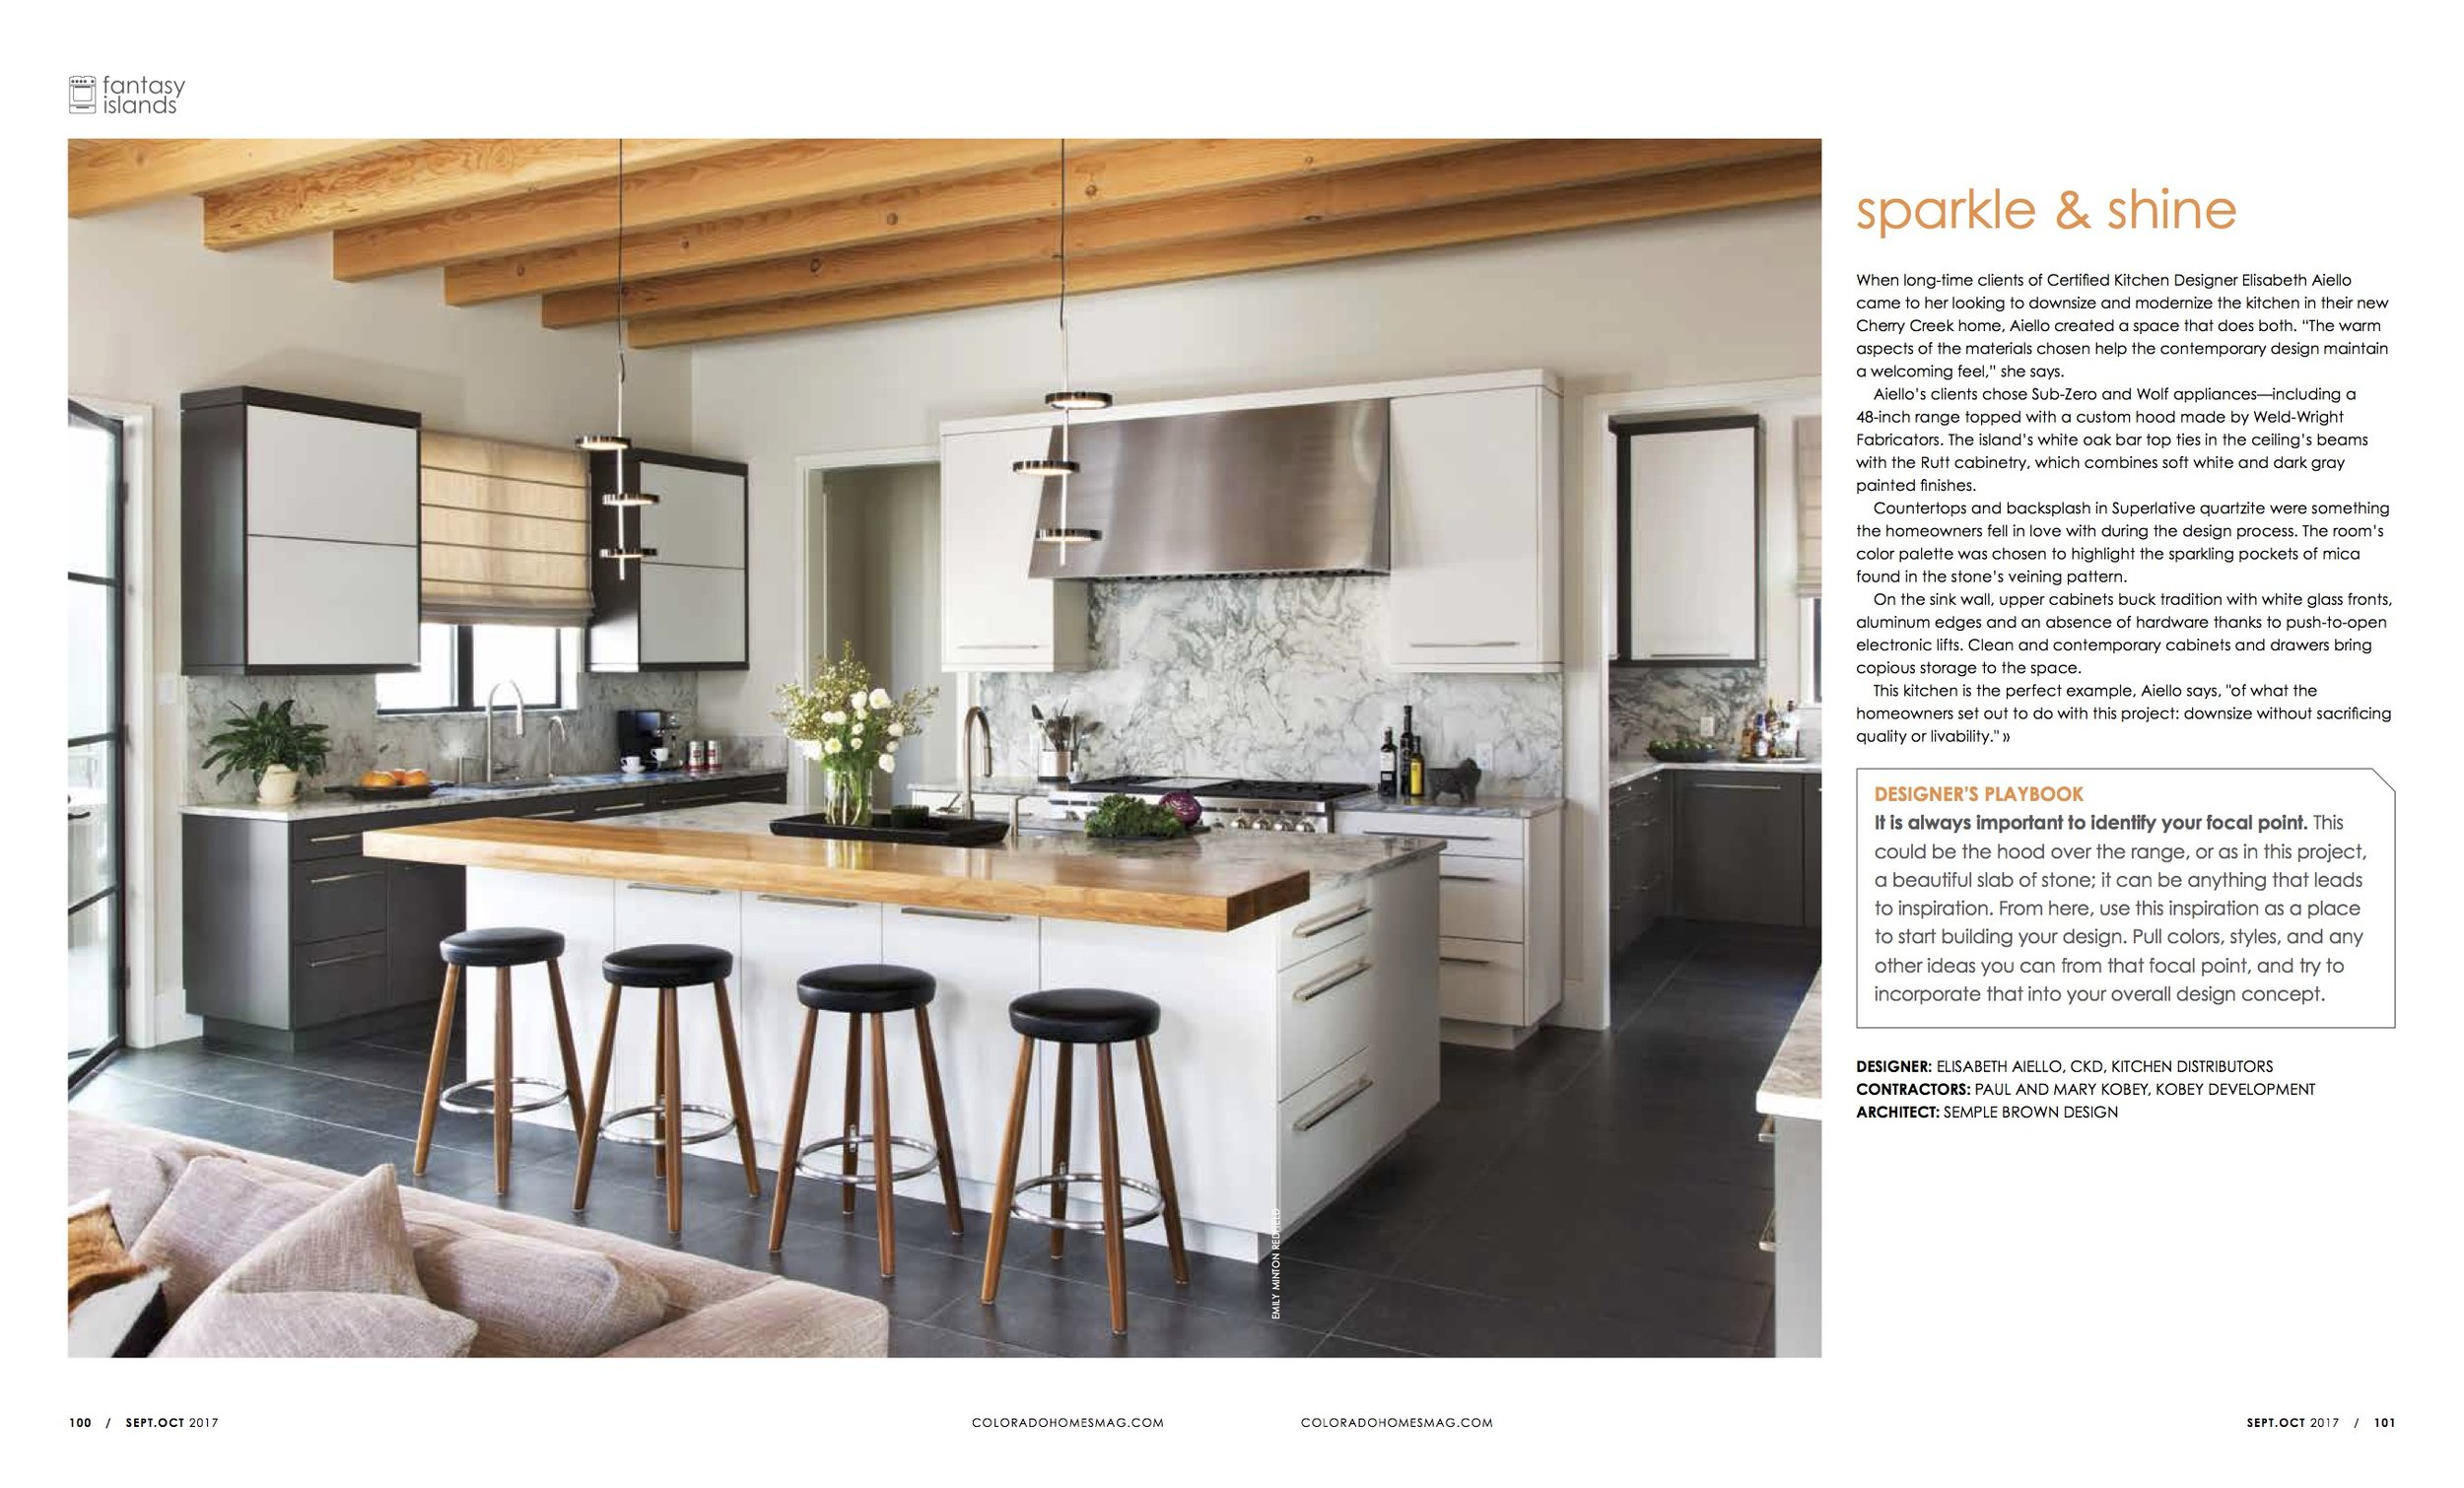 kitchens sp6.jpg